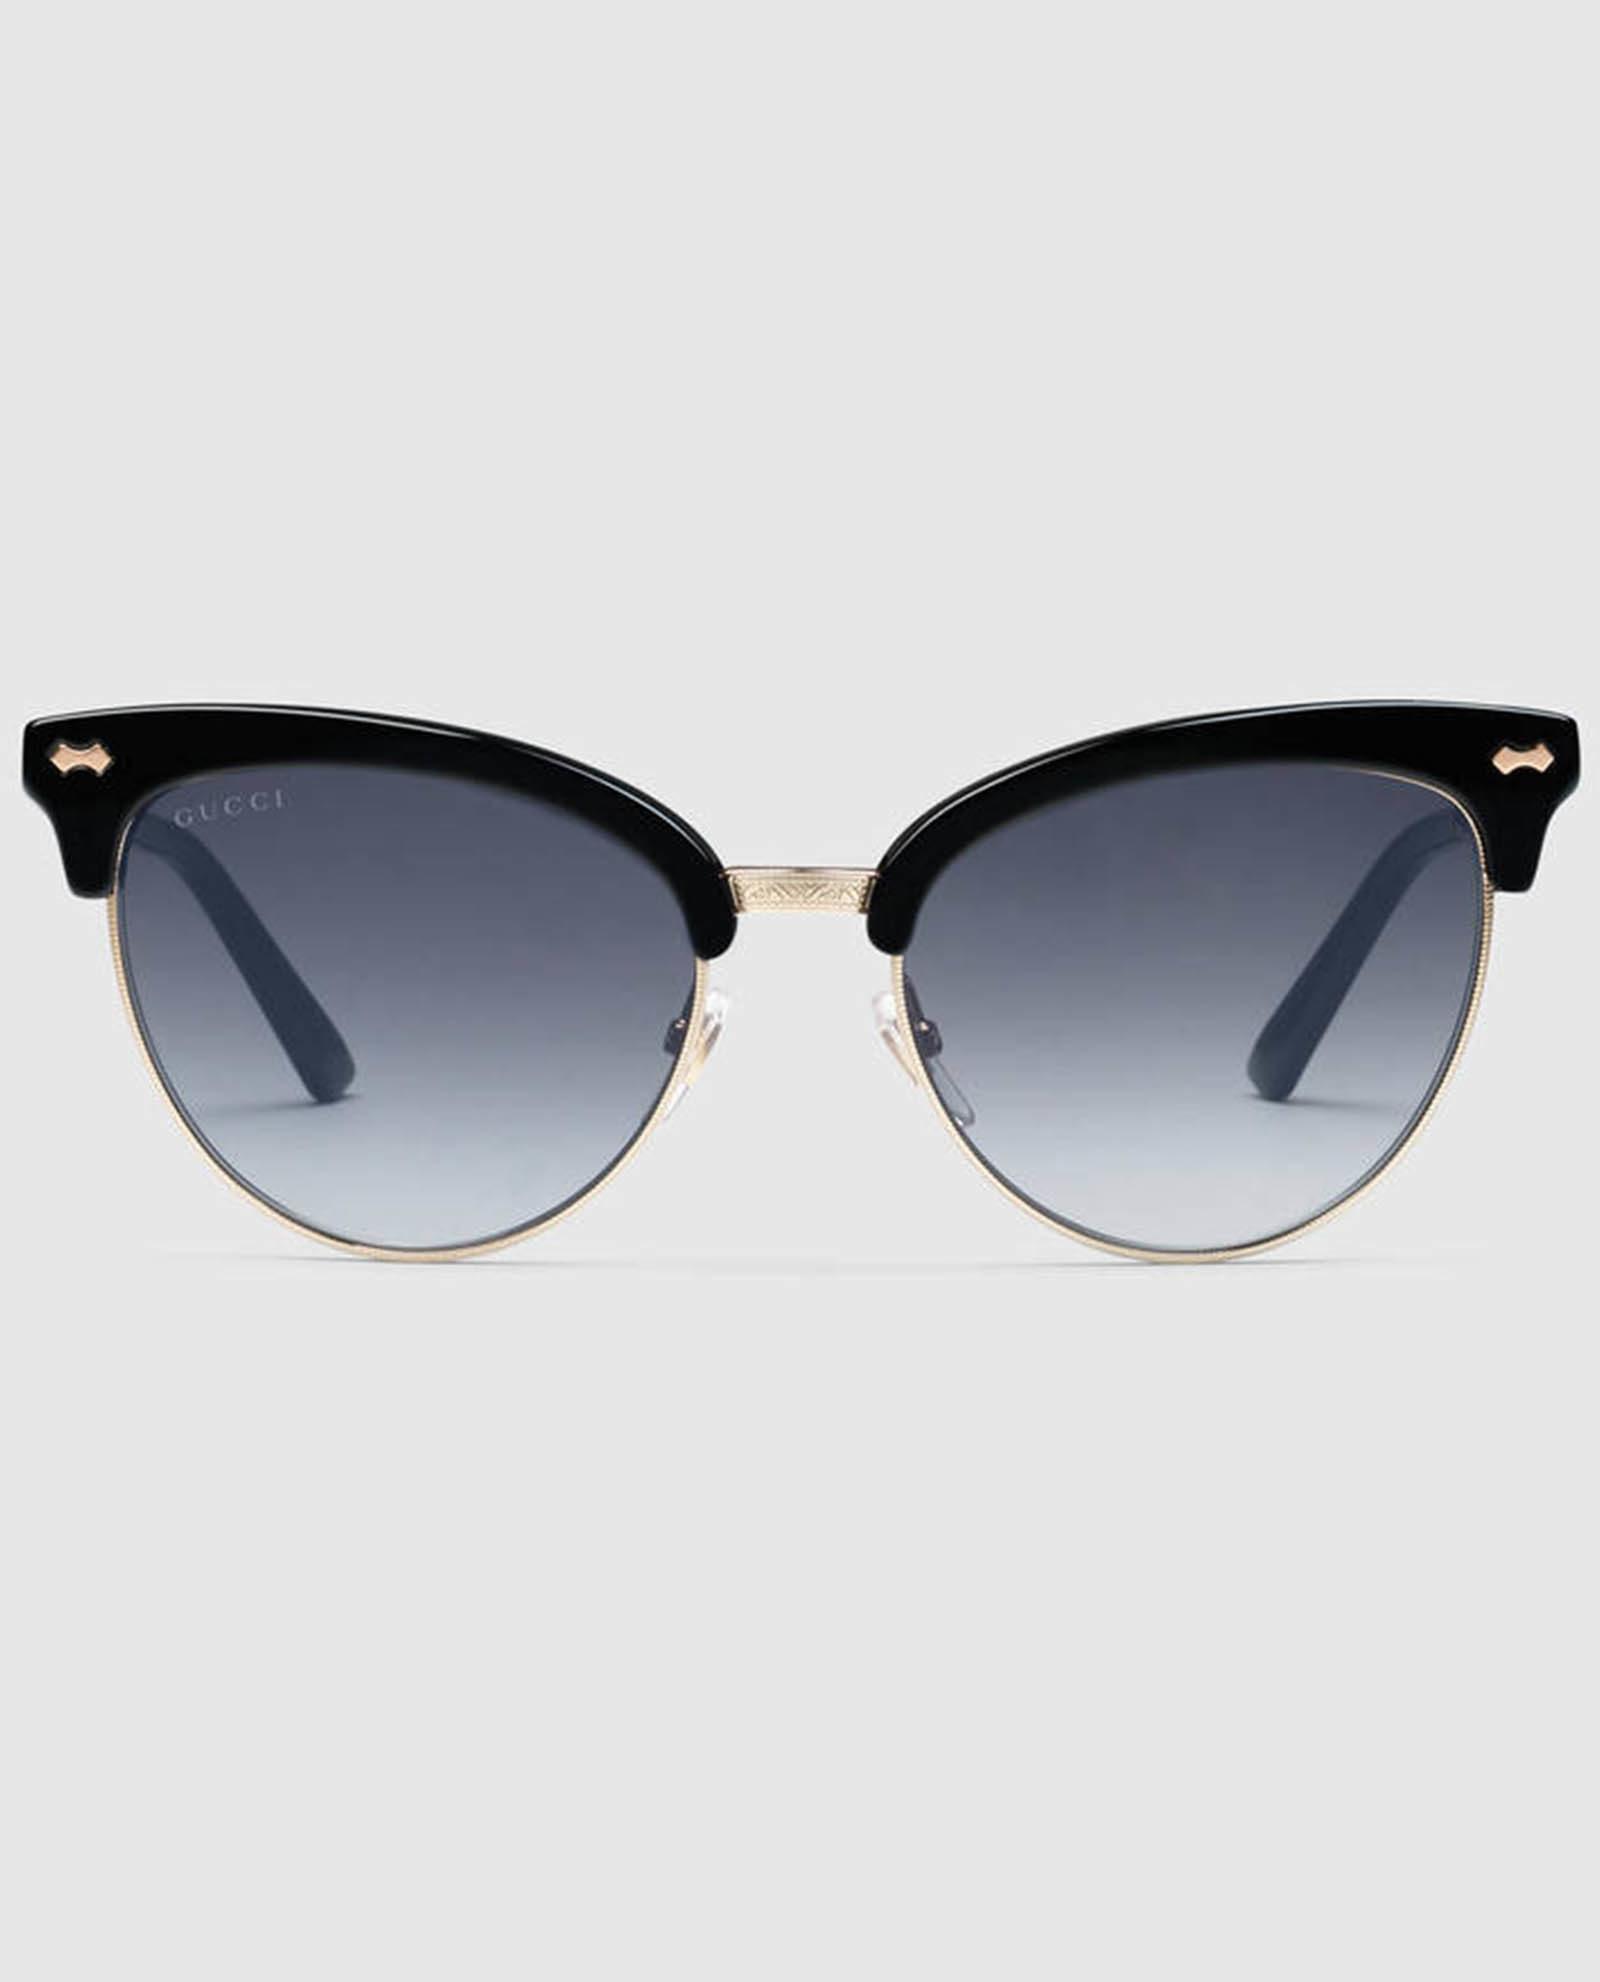 https://www.polydoruoptika.gr/wp-content/uploads/2018/03/434072_I3330_1890_001_100_0000_Light-Cat-eye-acetate-and-metal-sunglasses-GUCCI-WOMAN.jpg